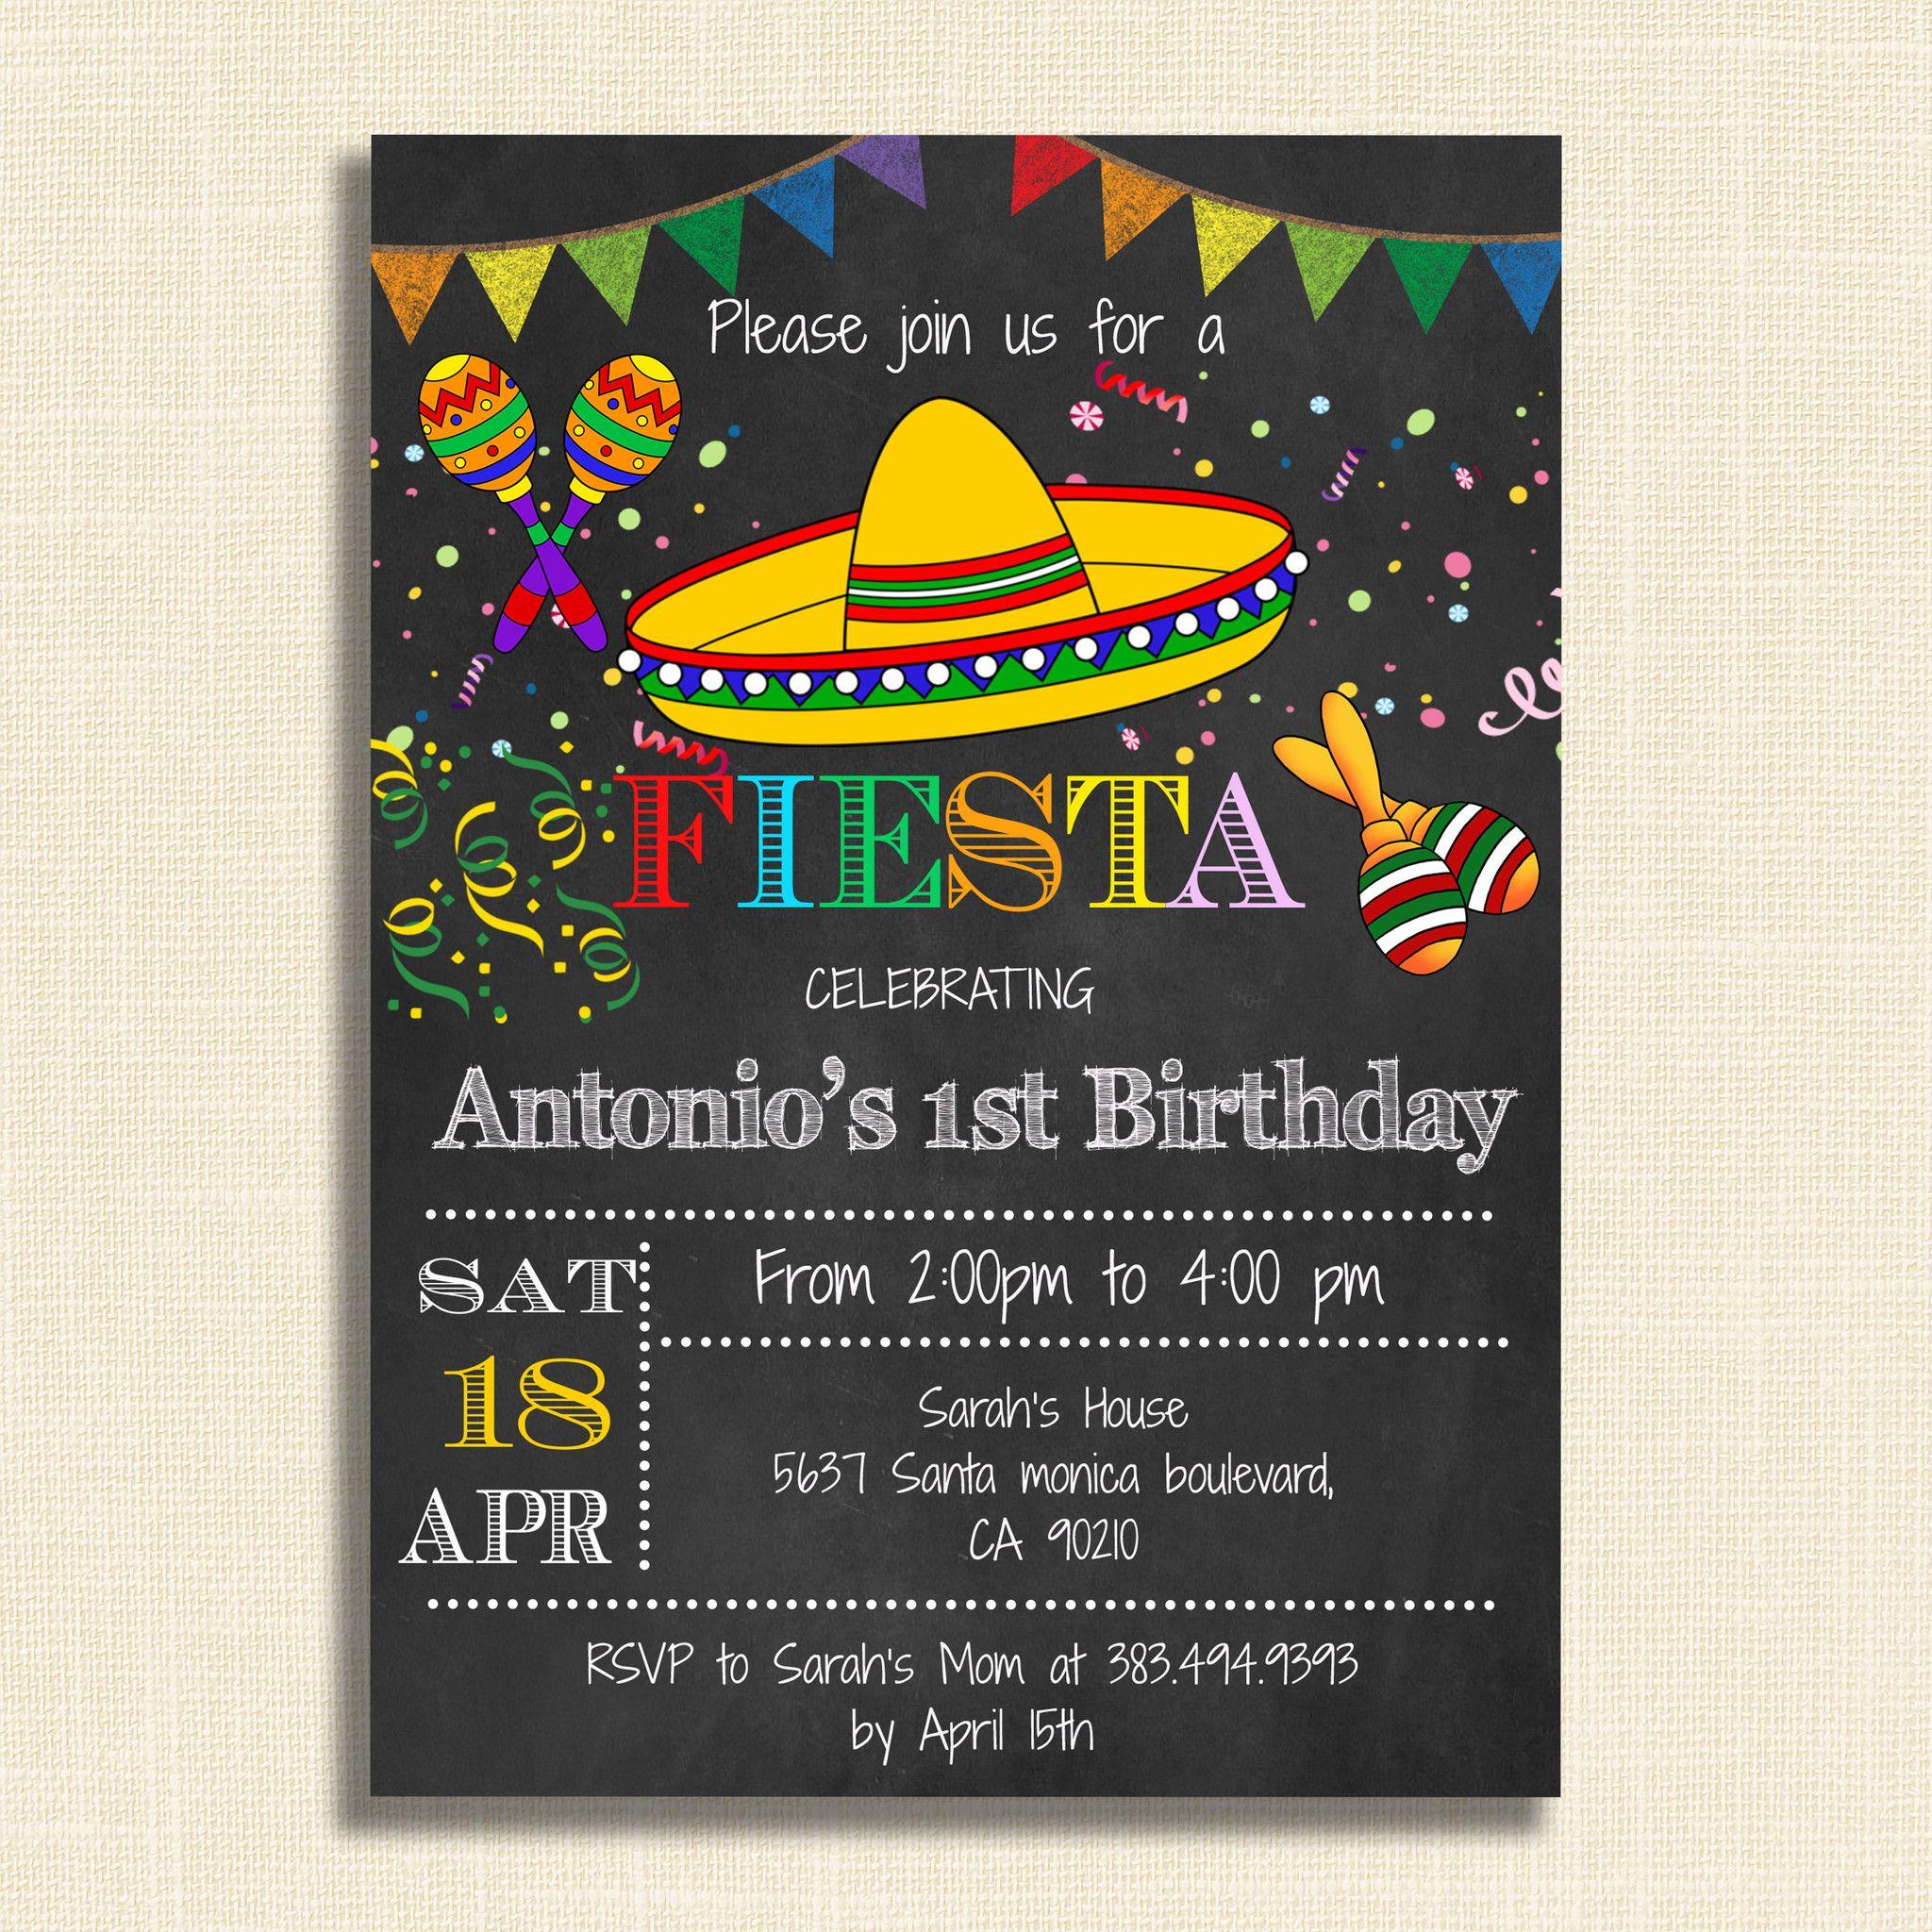 Printable mexican fiesta party invitations – DIY Party Invitation